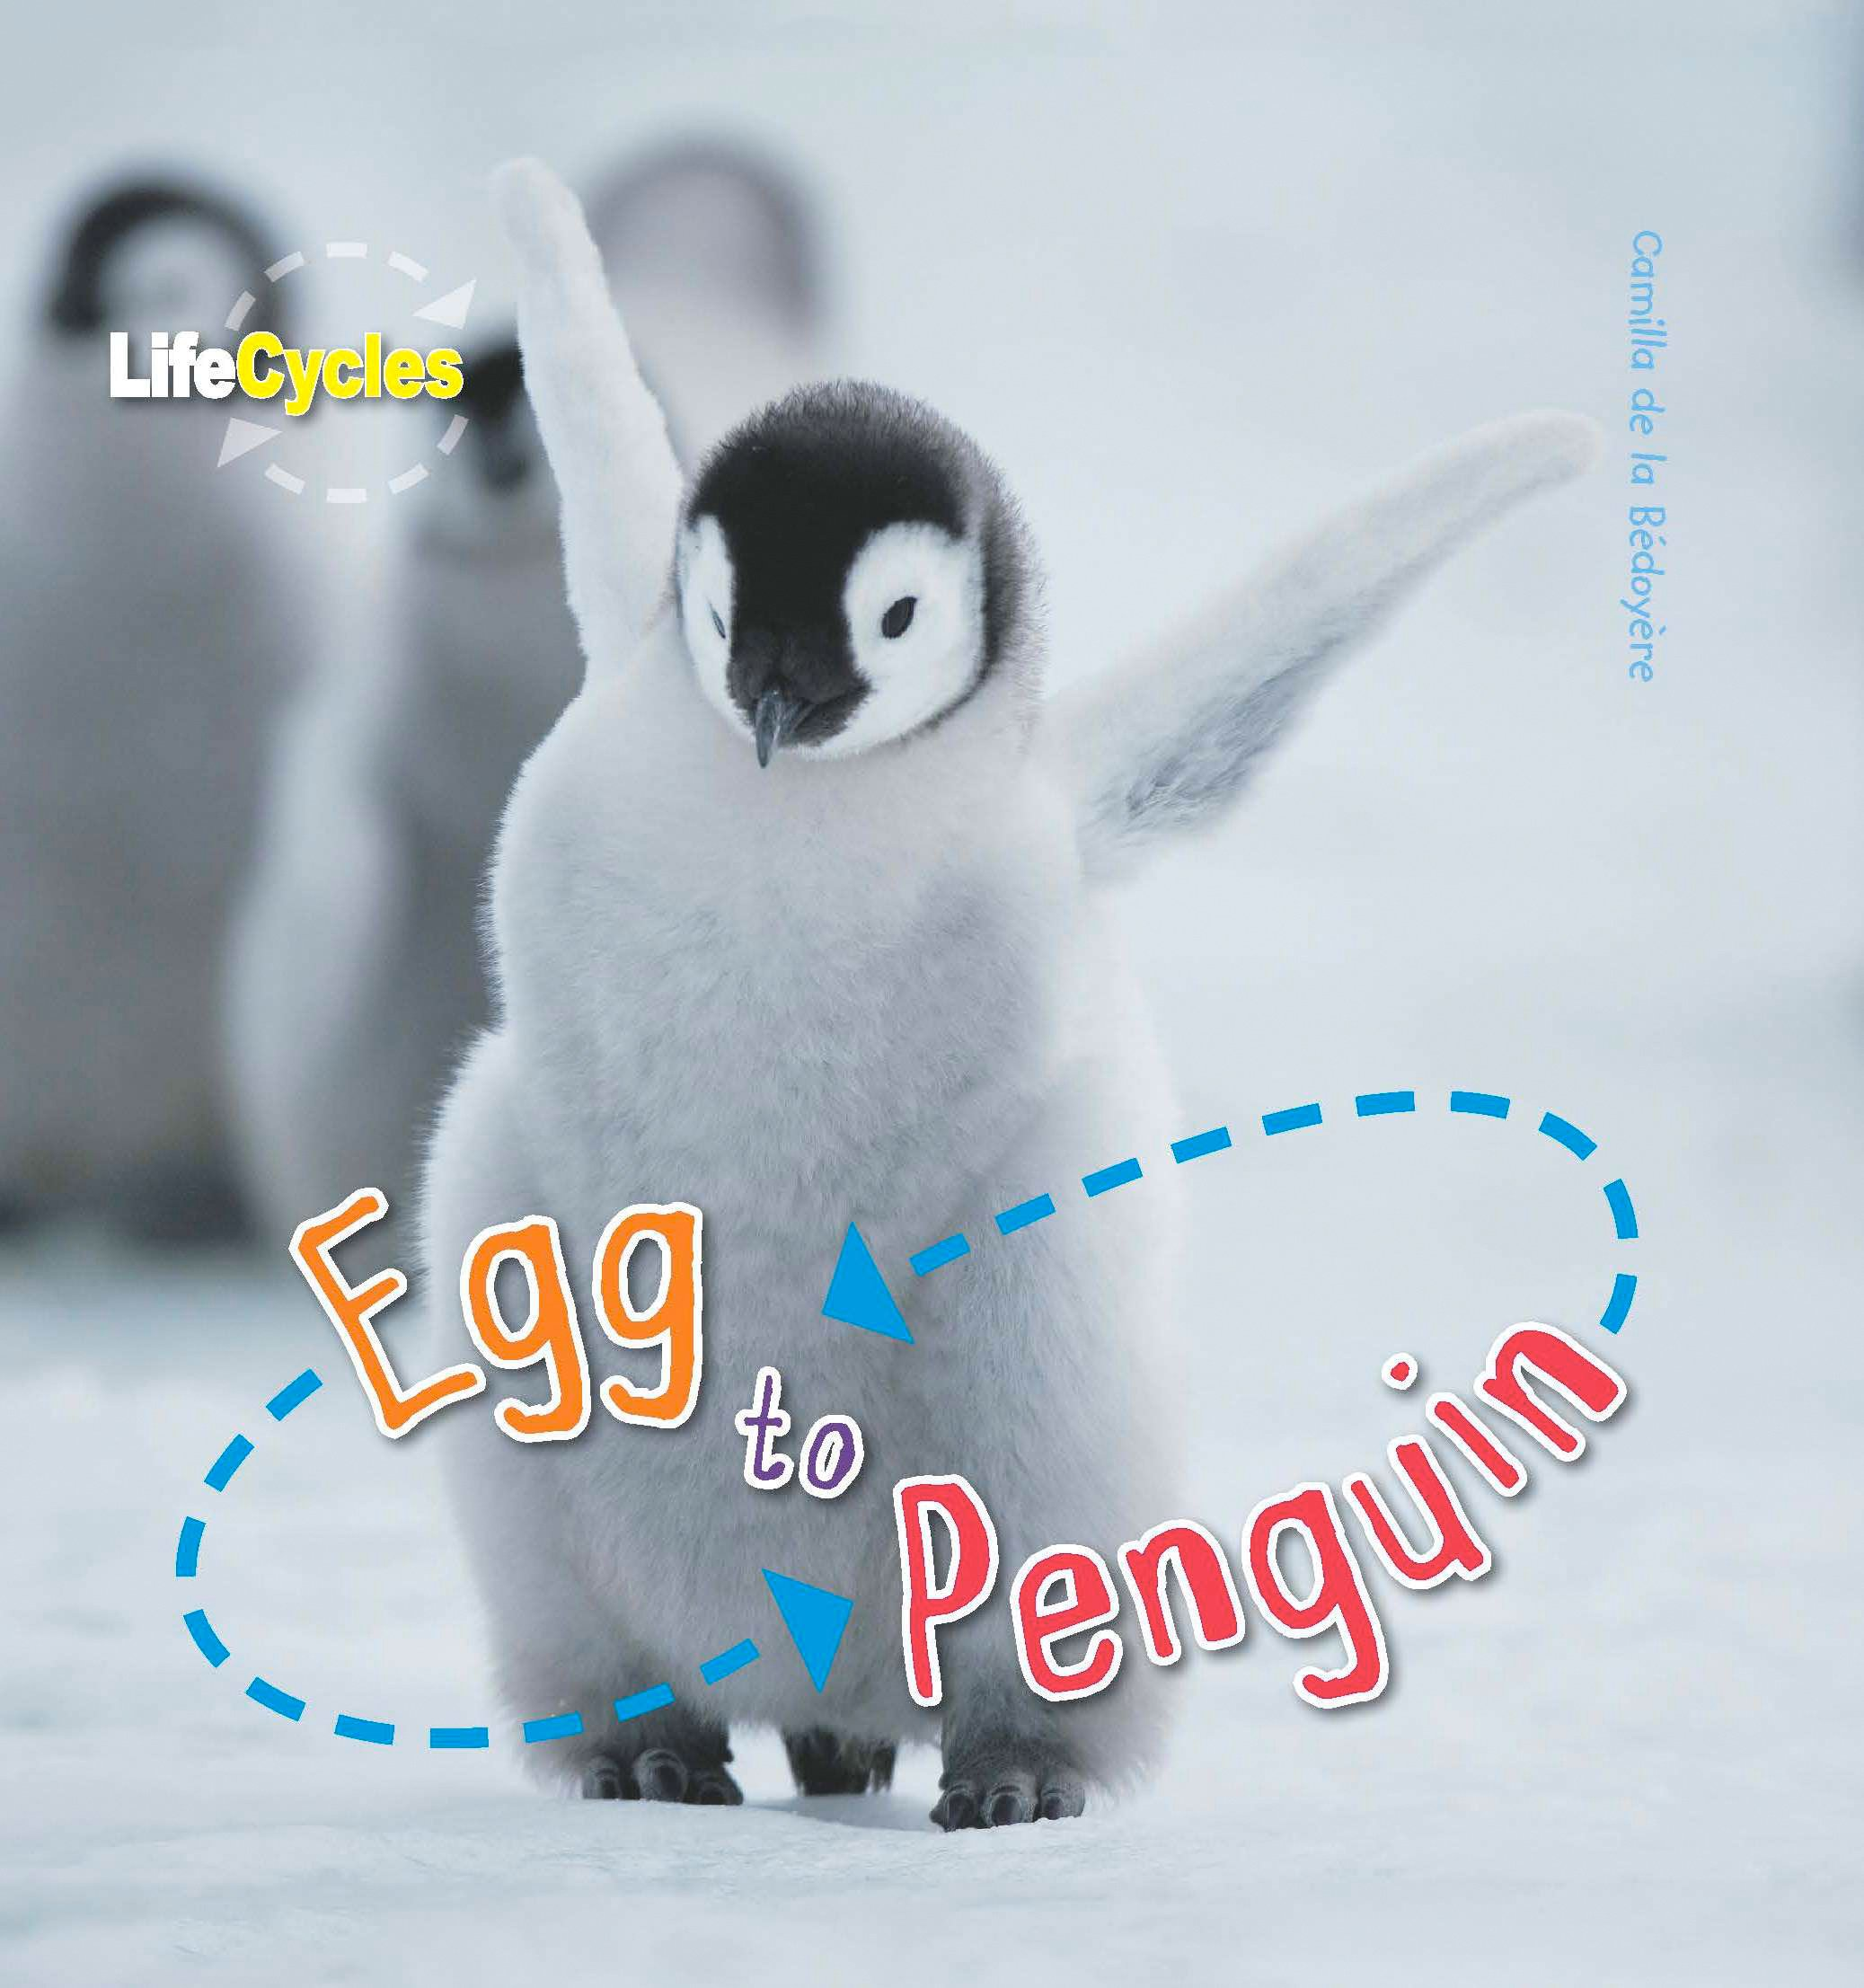 Life Cycles Egg To Penguin Amazon Co Uk De Le Bedoyere Camilla 9781848355835 Books